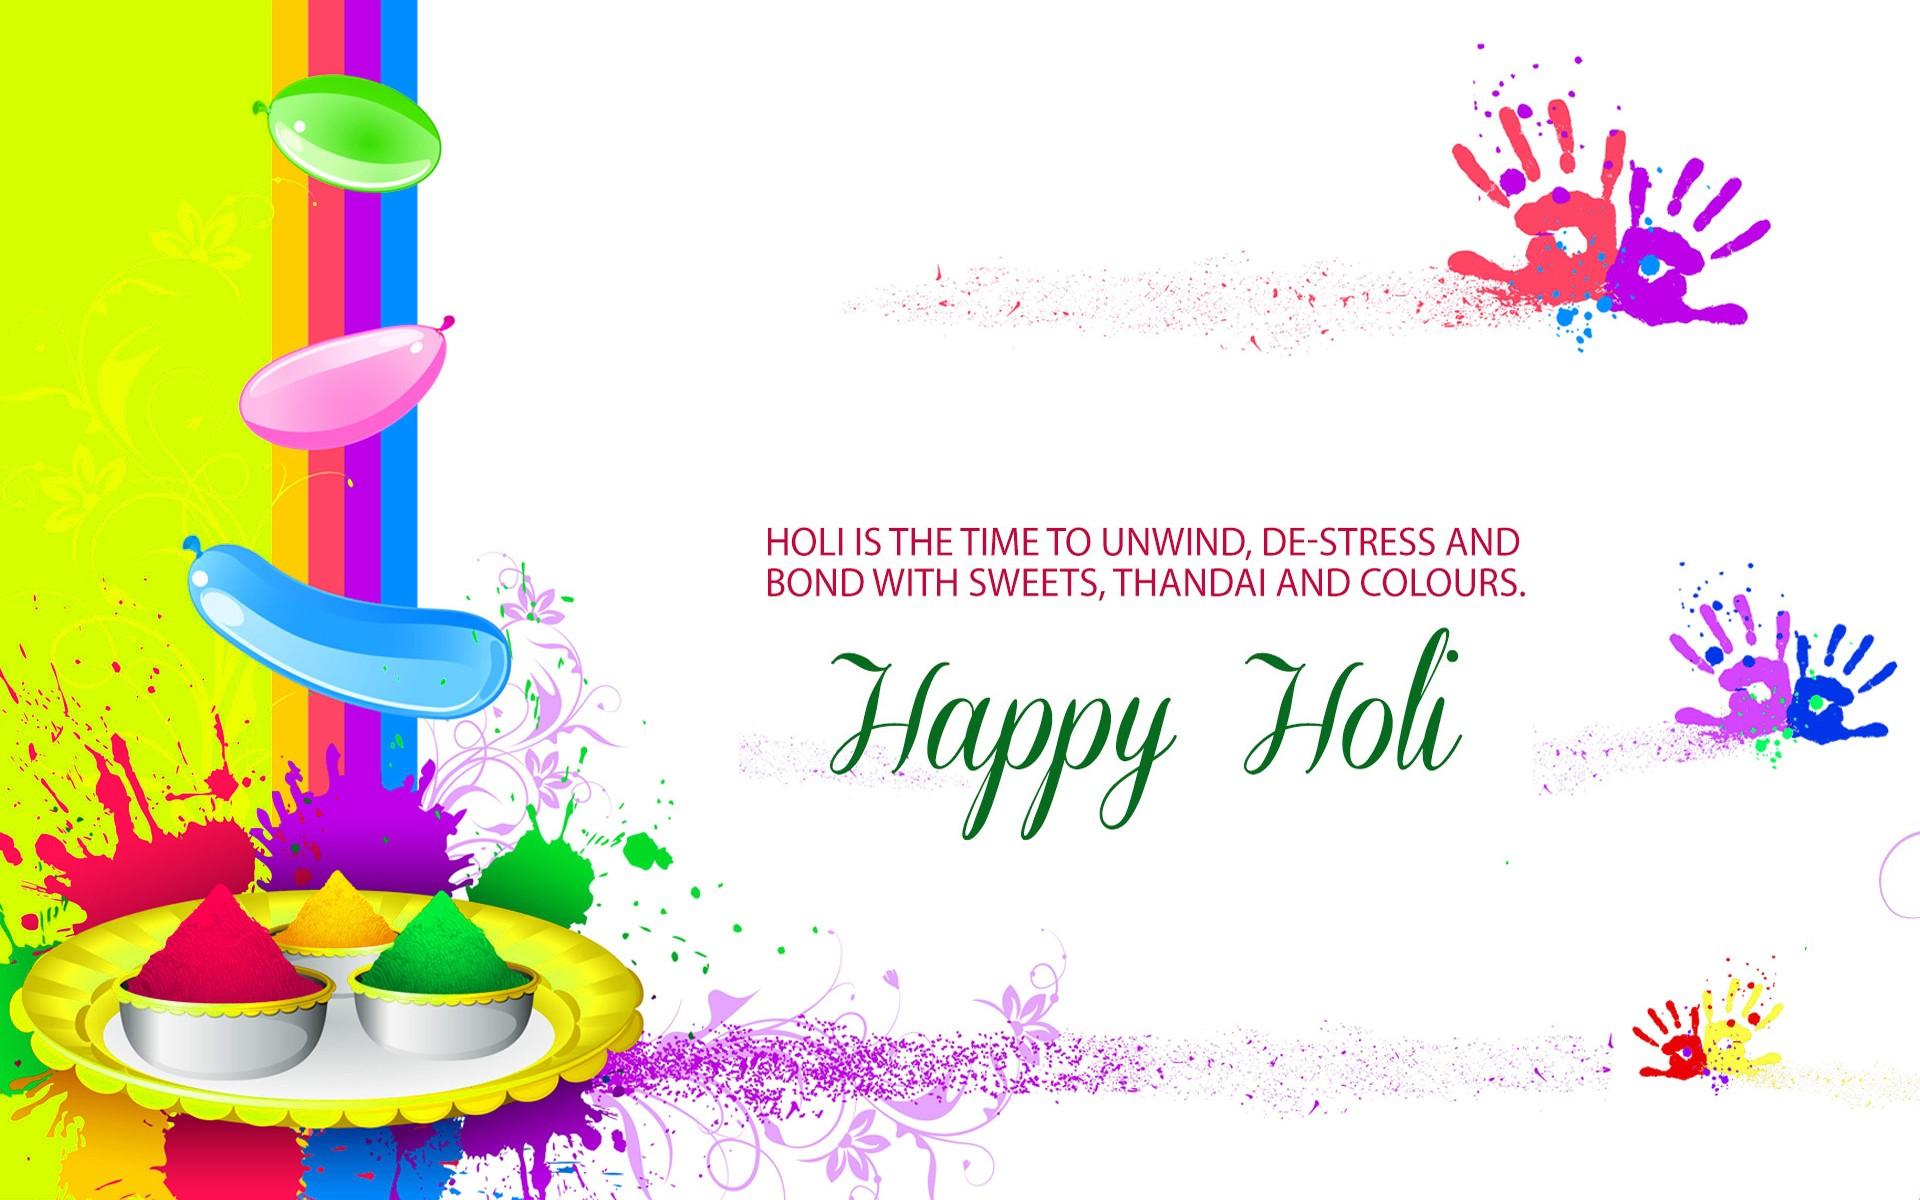 Holi 3d Wallpaper Name World Hindu News Wishes All Hindus Joyous Amp Prosperous